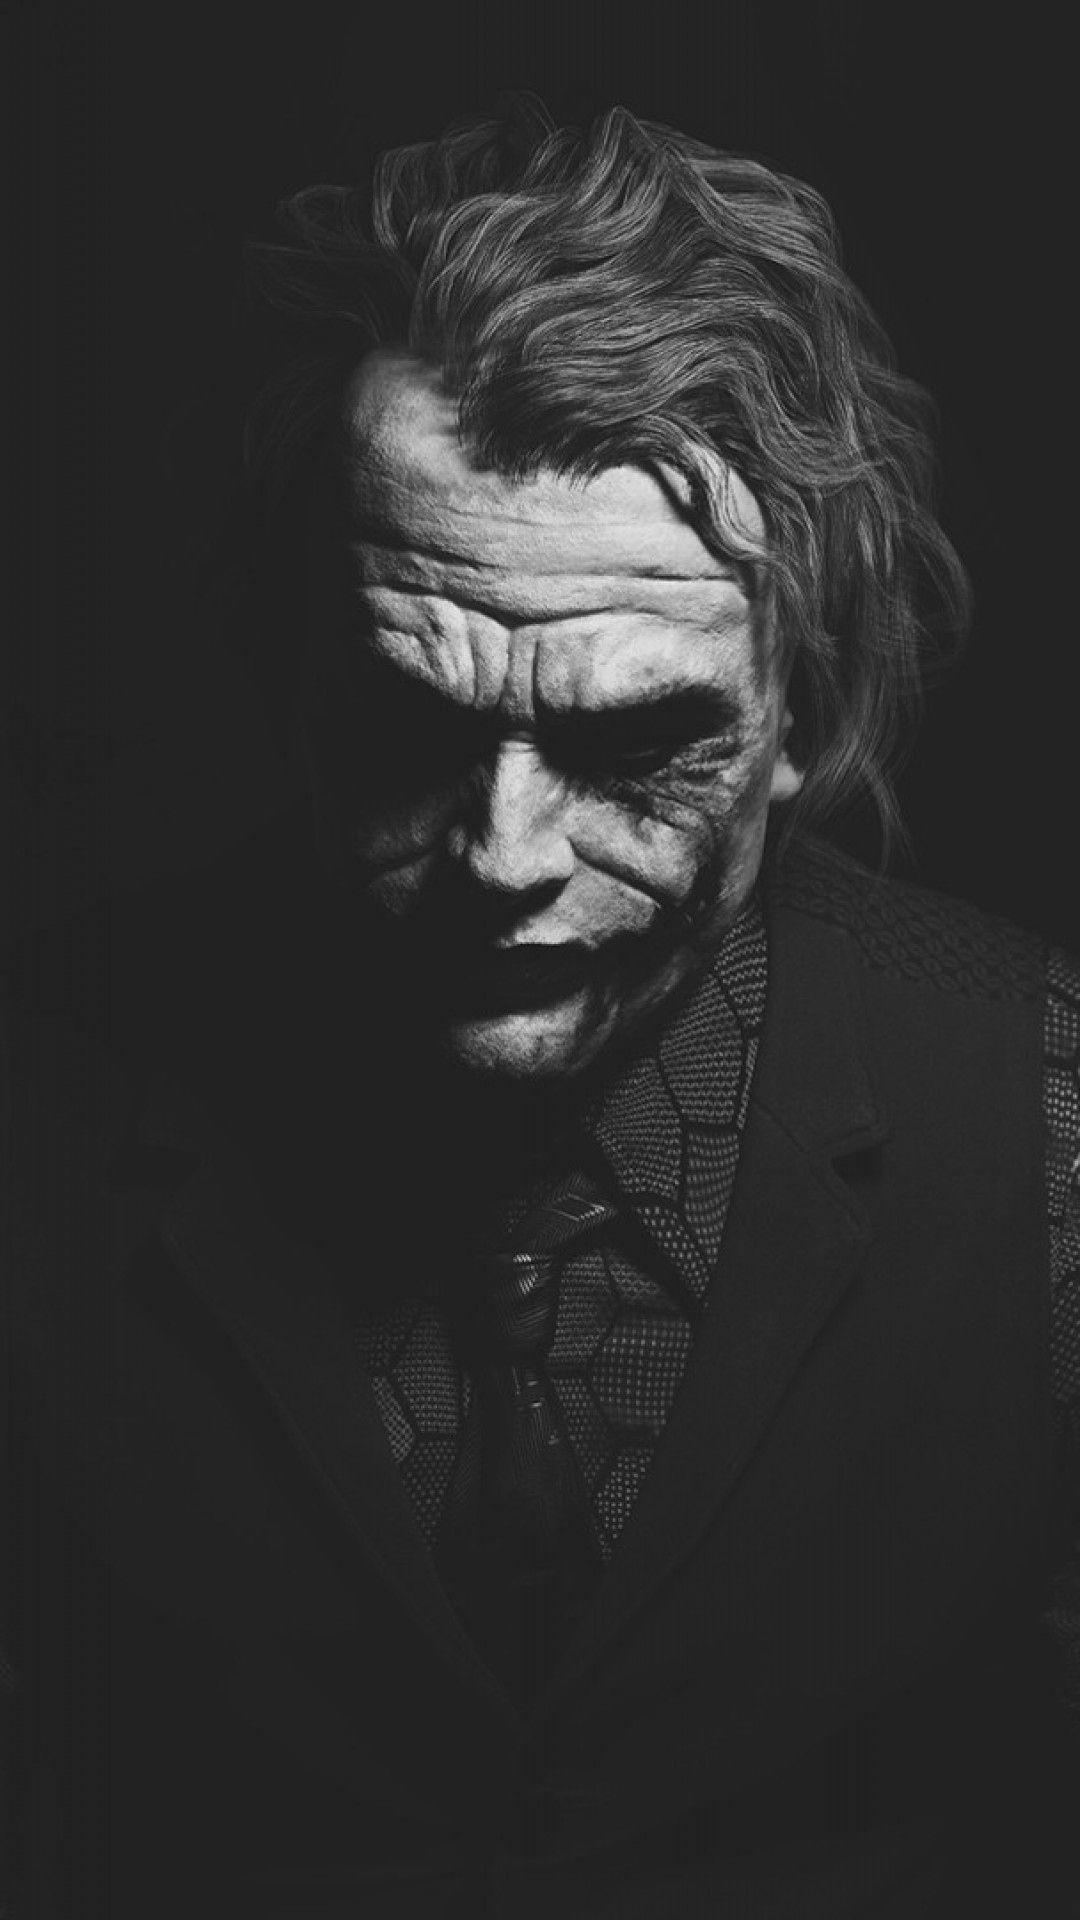 Heath Ledger Joker Iphone Wallpapers Top Free Heath Ledger Joker